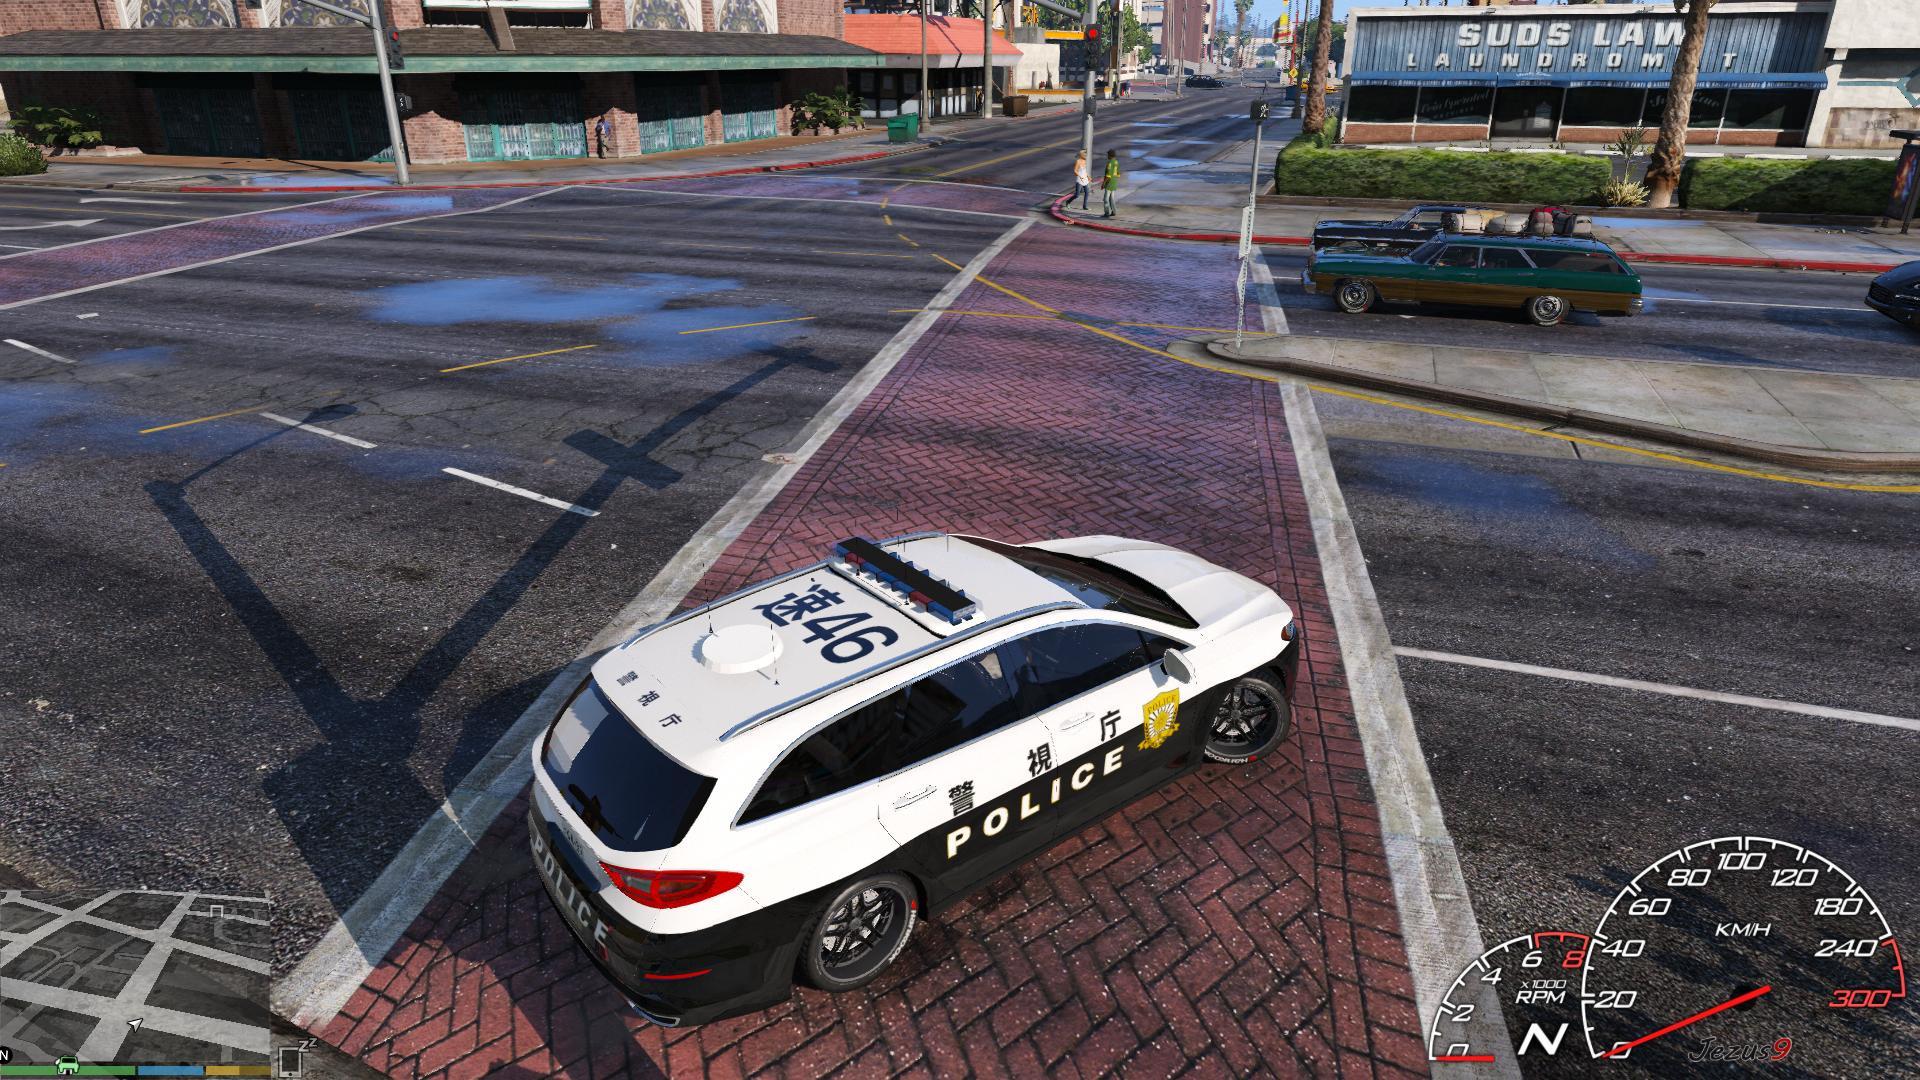 Ford Mondeo Japanese Police Car Paintjob GTA5 Mods